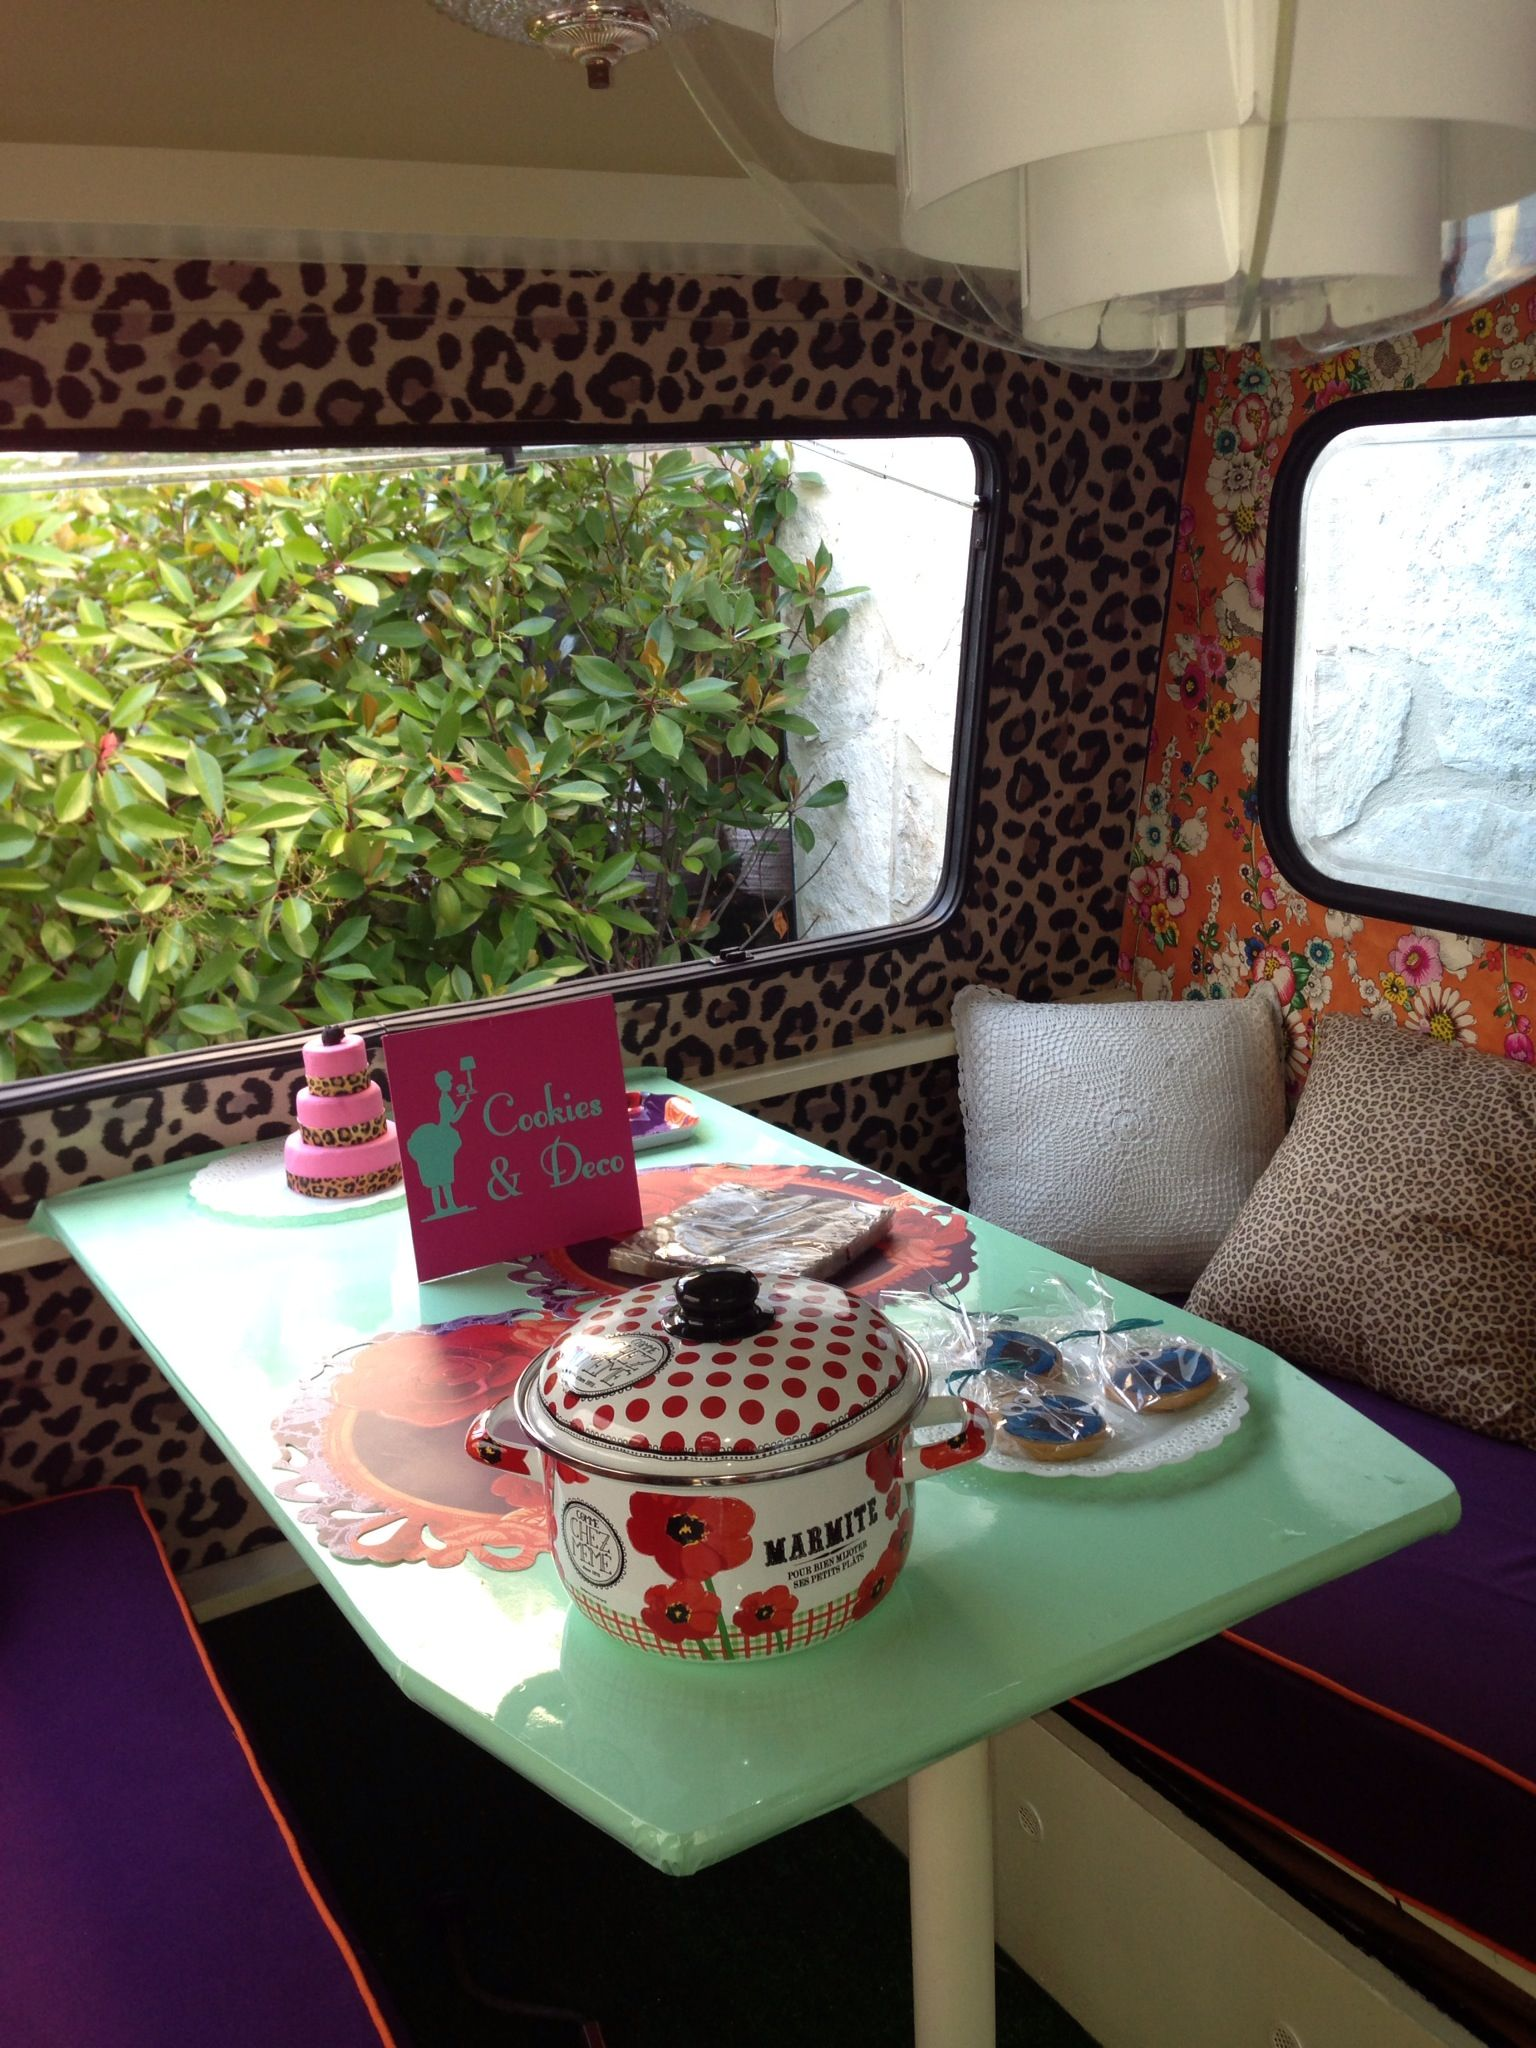 Interior caravana decoraci n decoration alg n d a tendr una caravana camper trailers - Decoracion interior caravanas ...